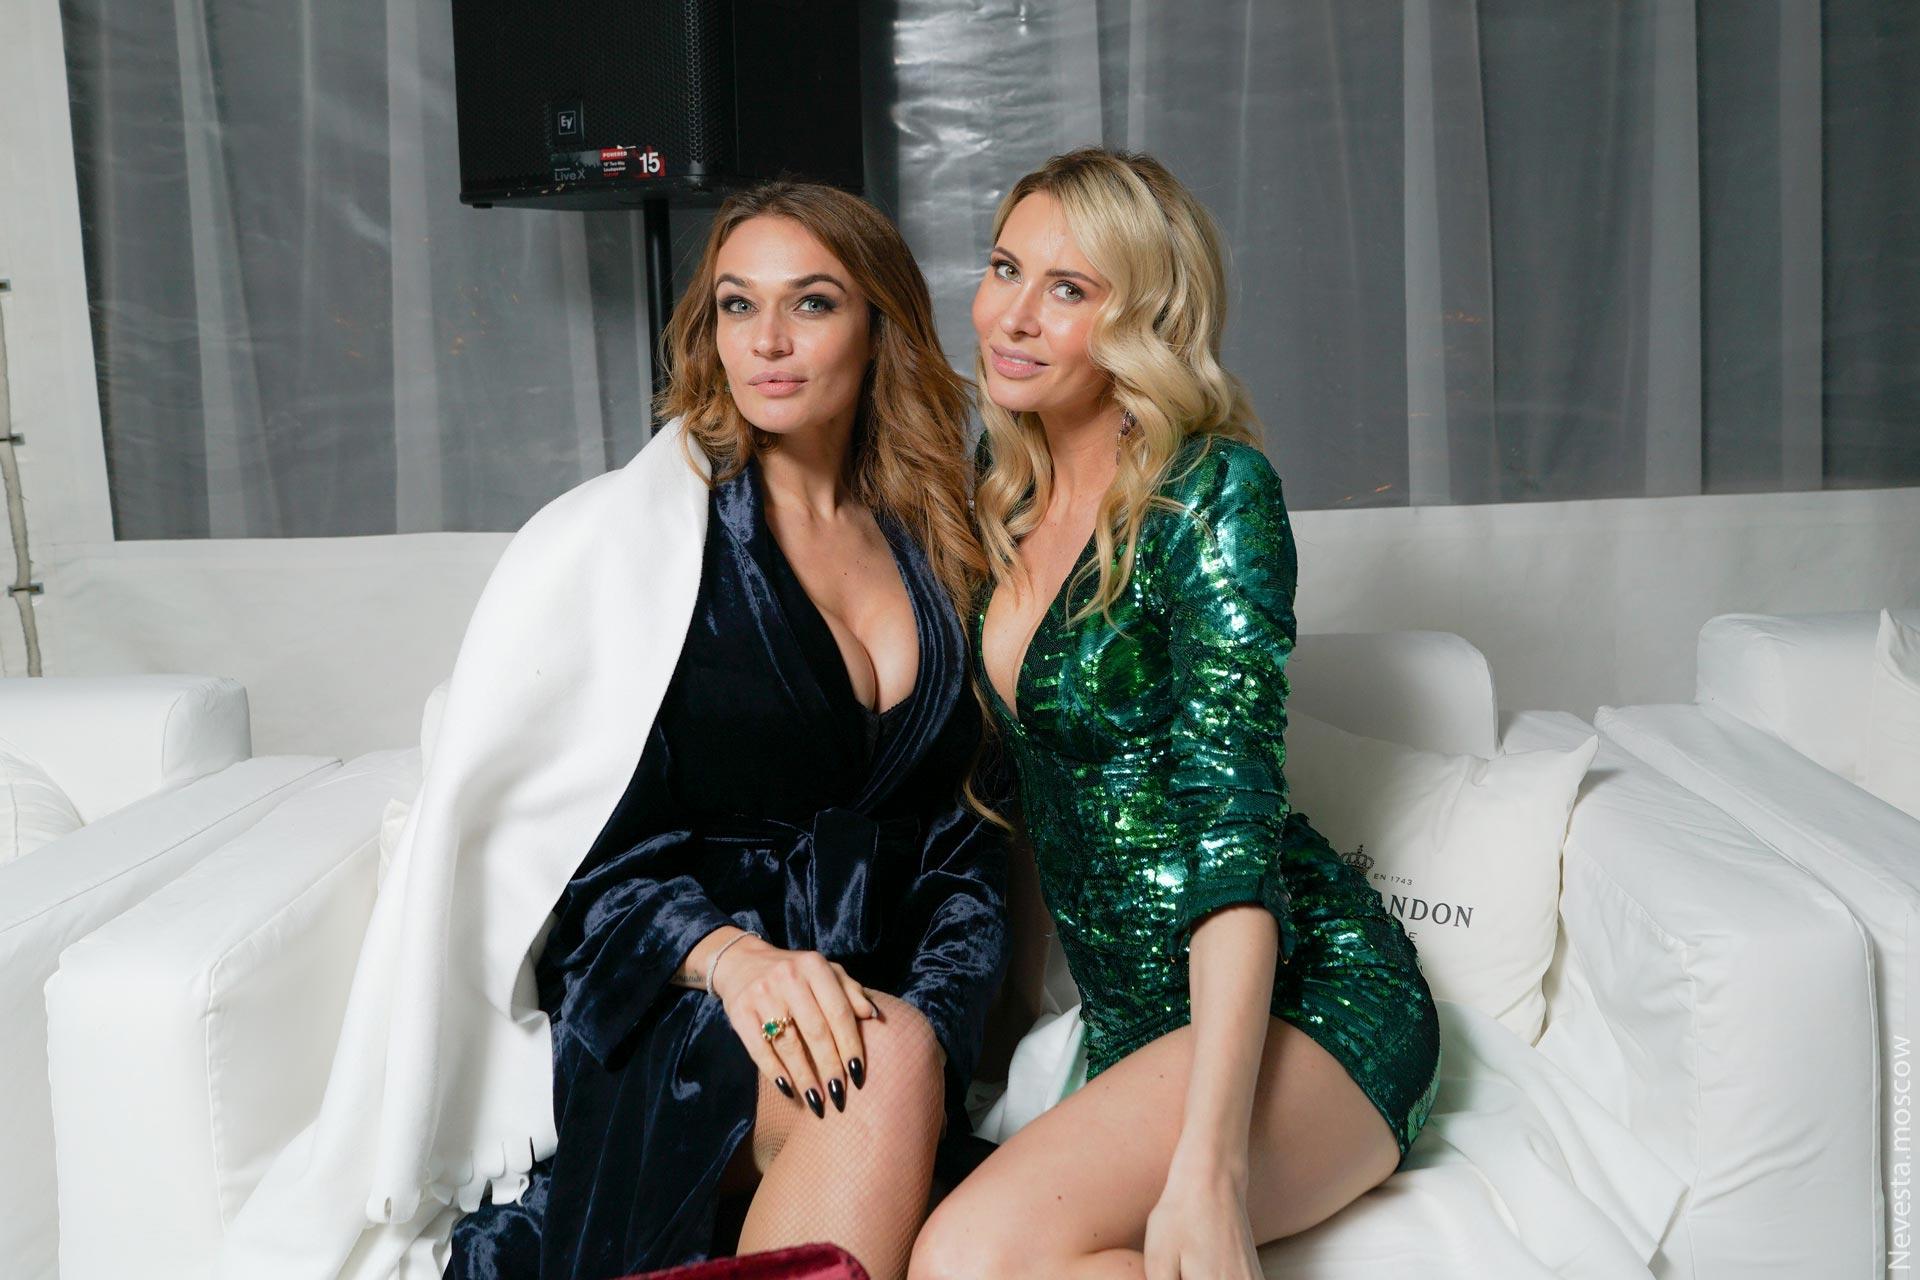 Свадьба Нелли Ермолаевой и Кирилла Андреева фото 39